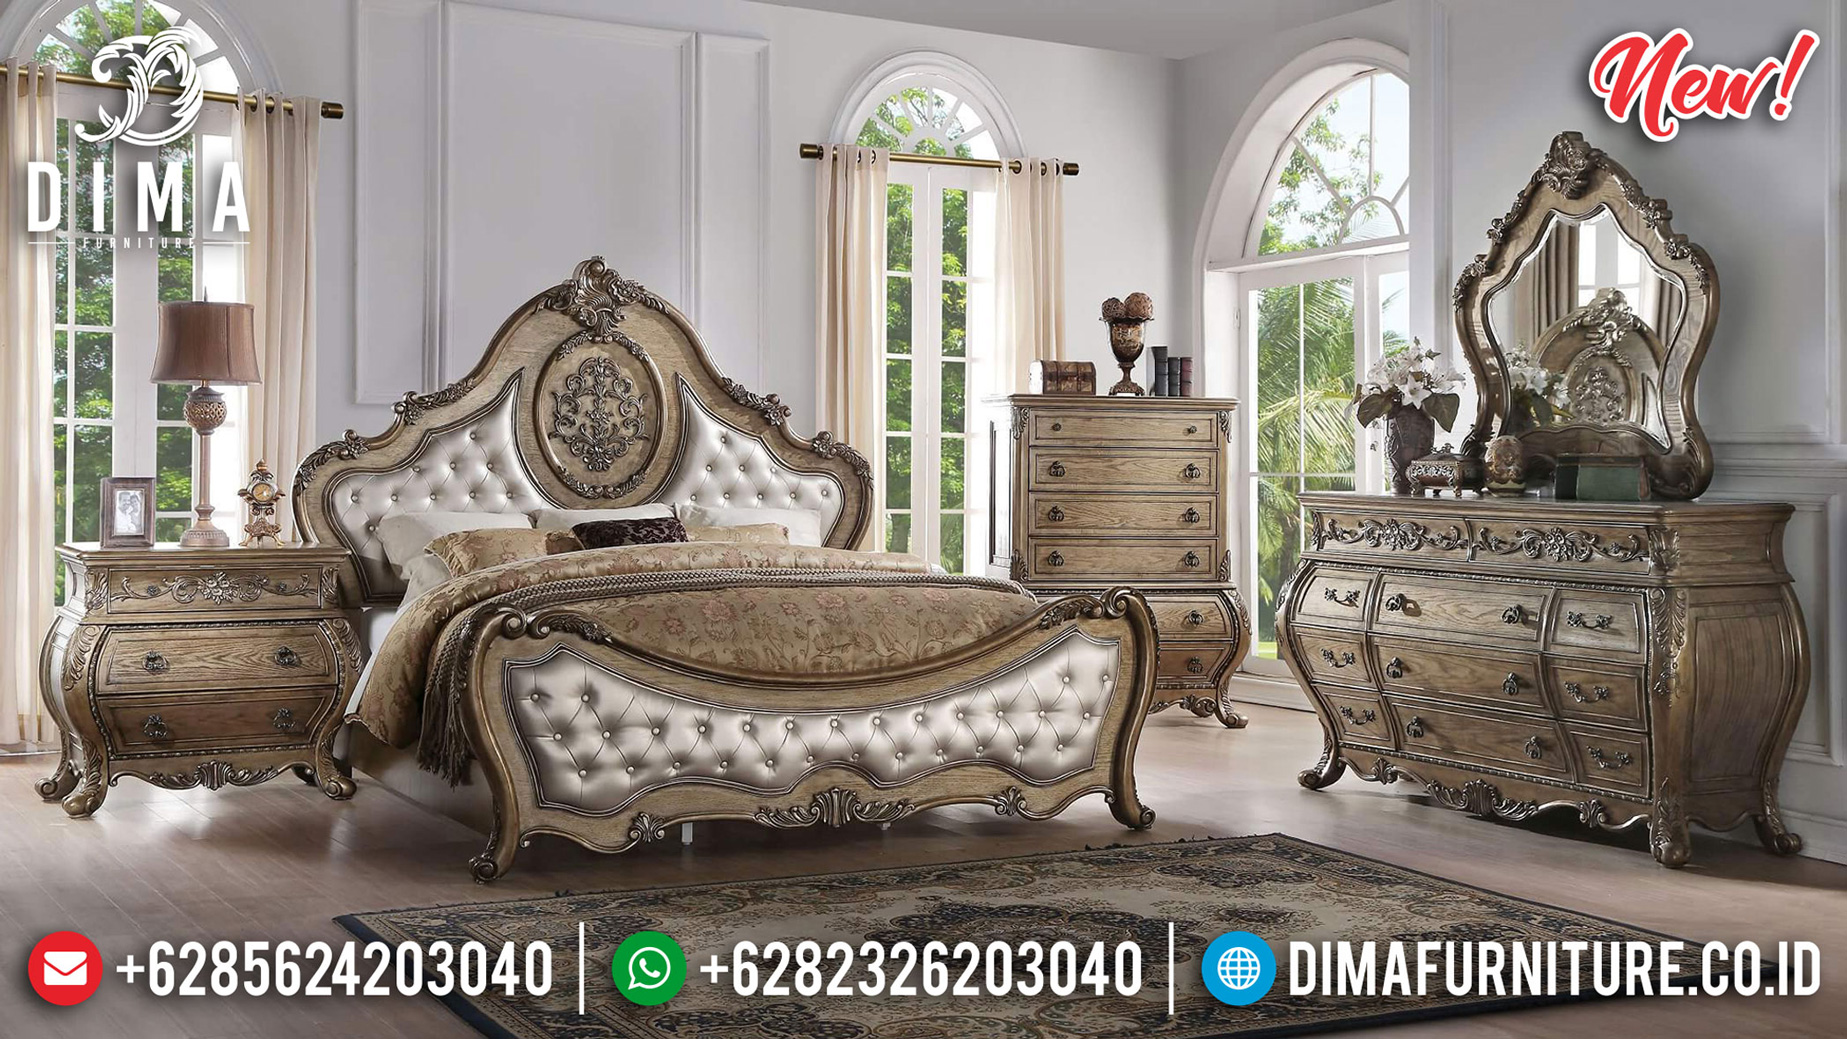 New Tempat Tidur Mewah Luxury Classic Jepara Furniture Elegant Style ST-1176